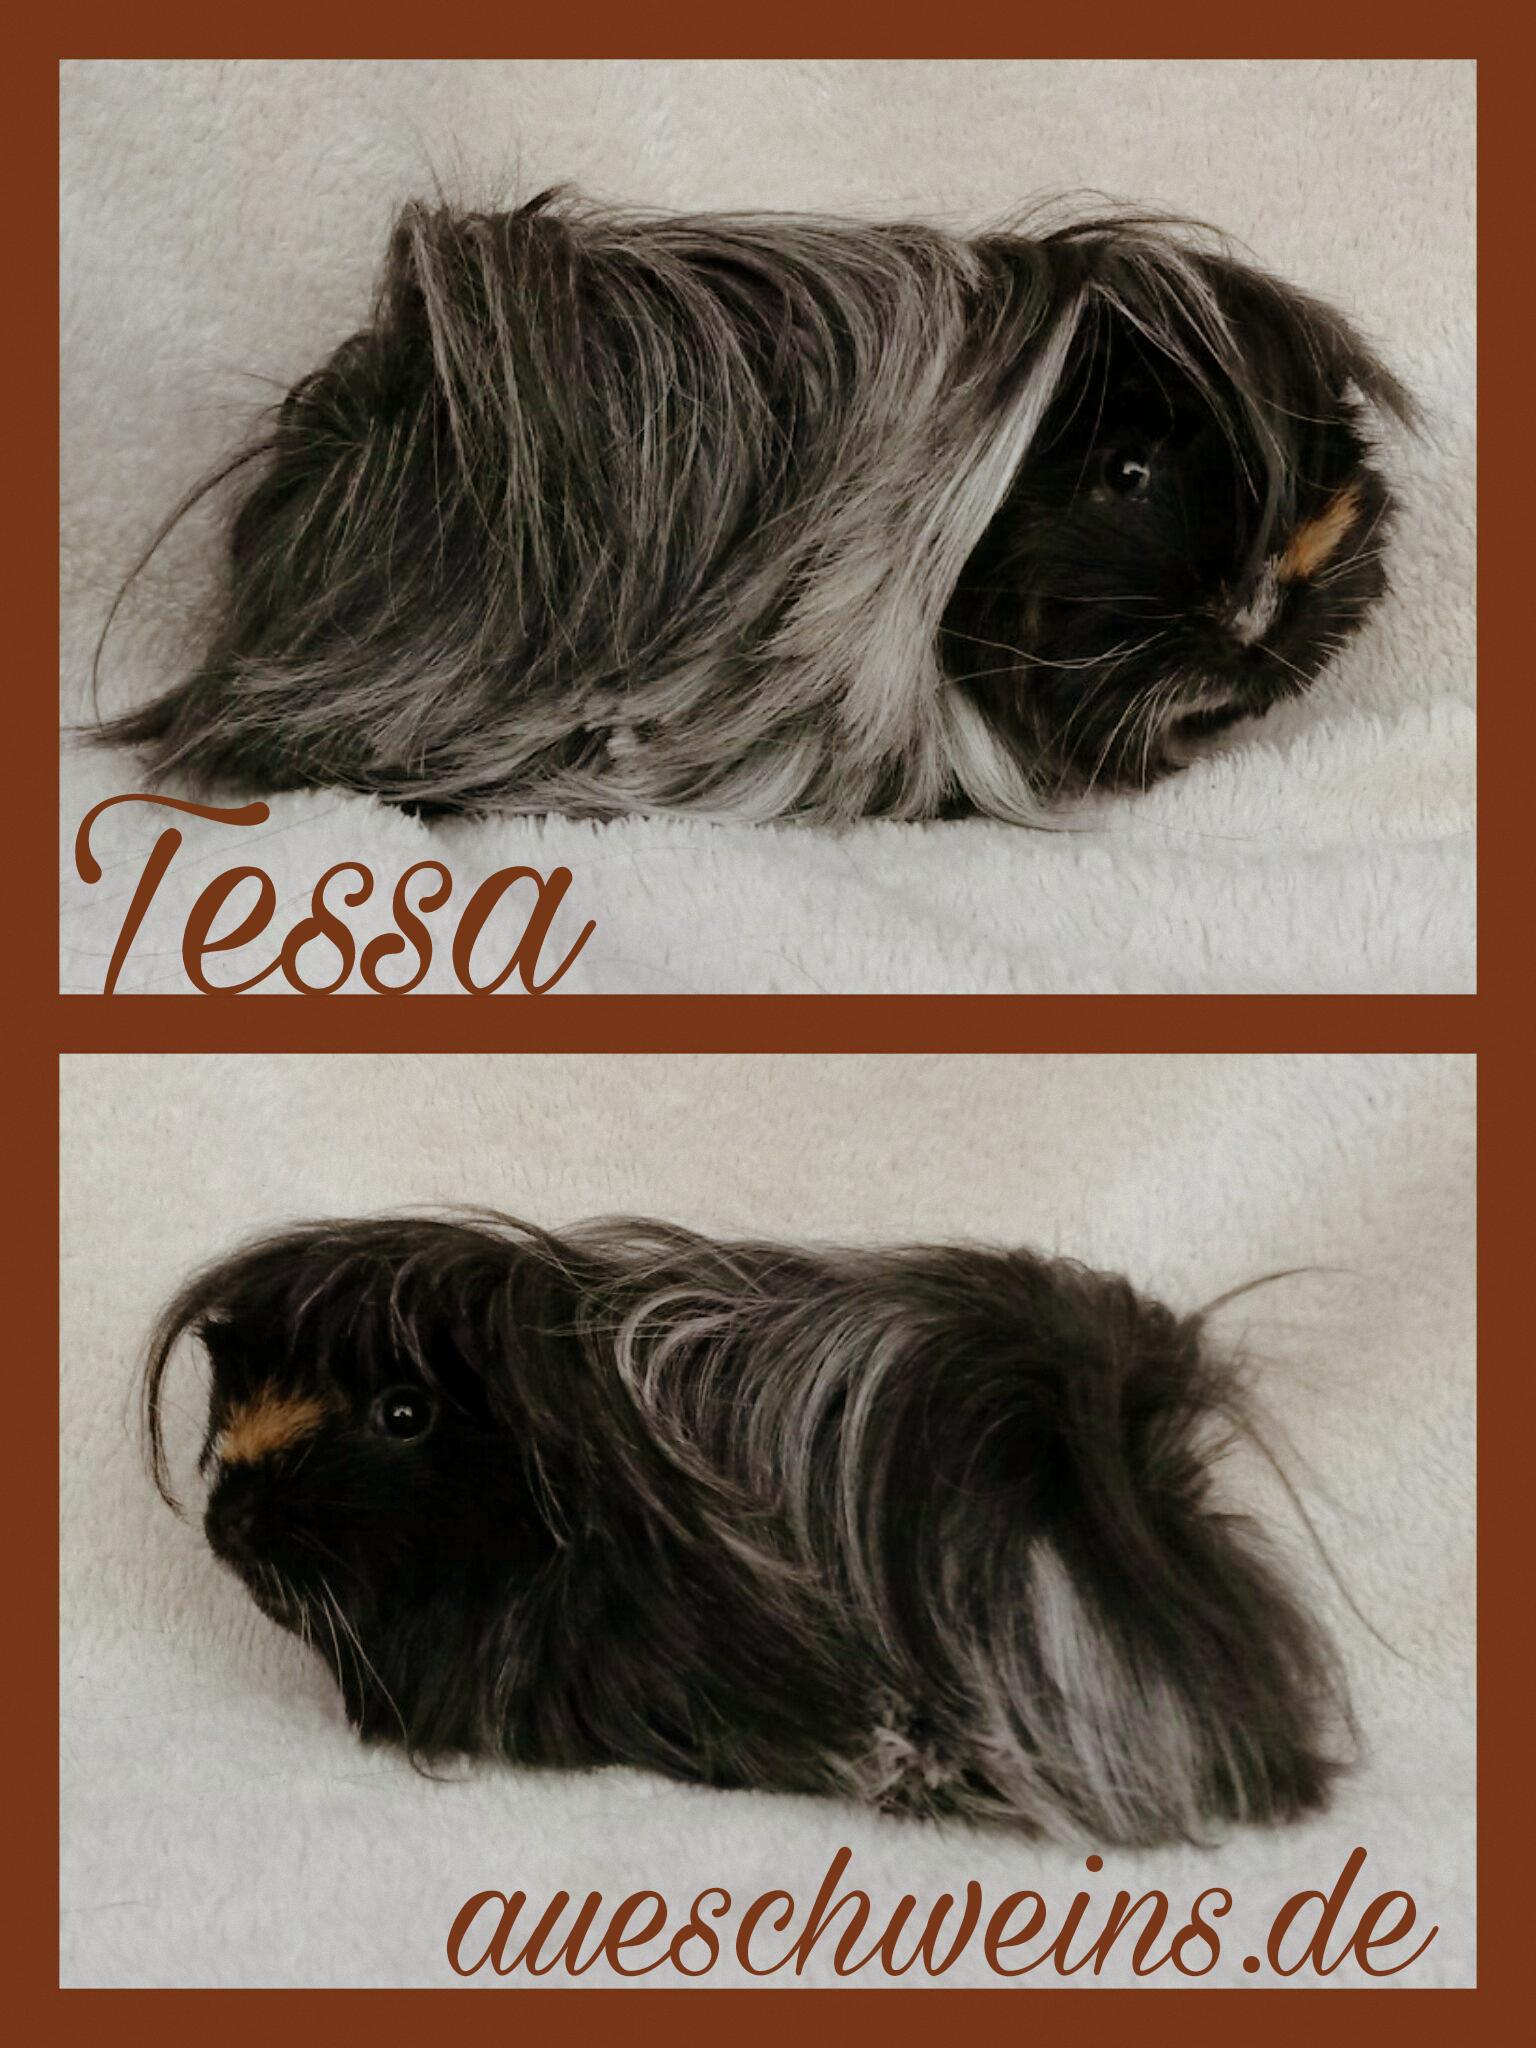 Tessa von Tinas Meeries